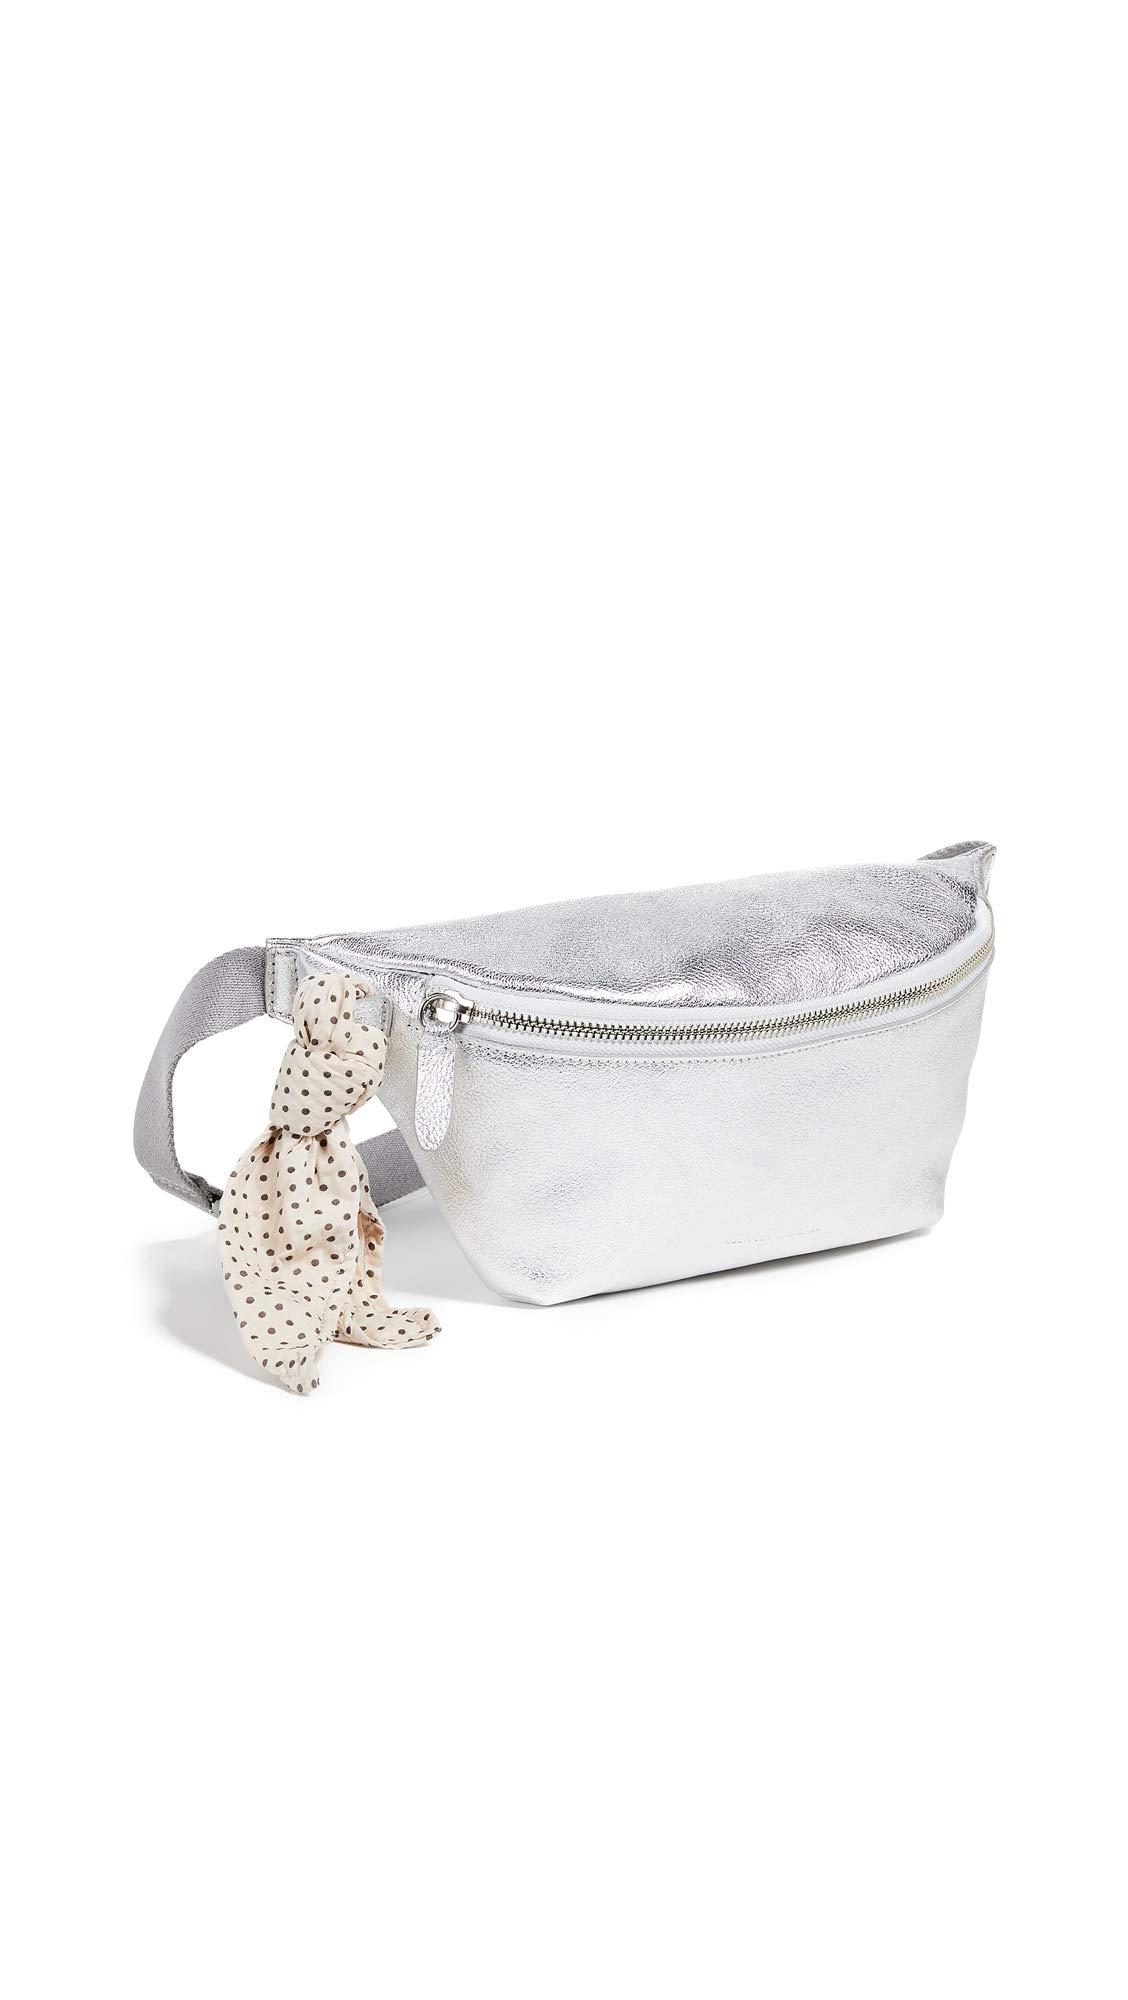 Loeffler Randall Women's Belt Bag, Silver, One Size